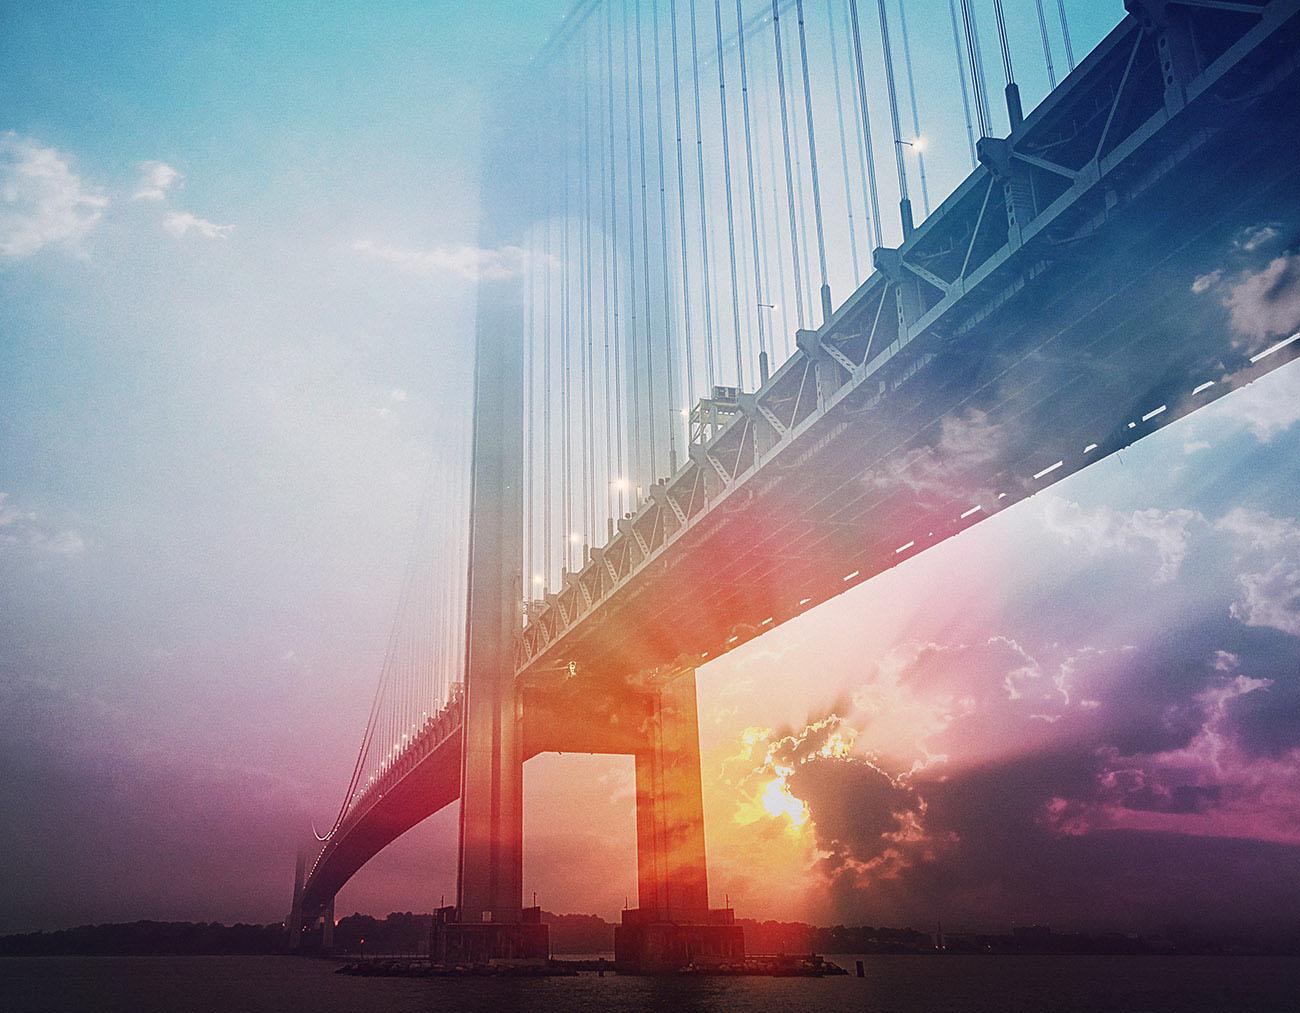 Surreal Suspension Bridge Stock Image